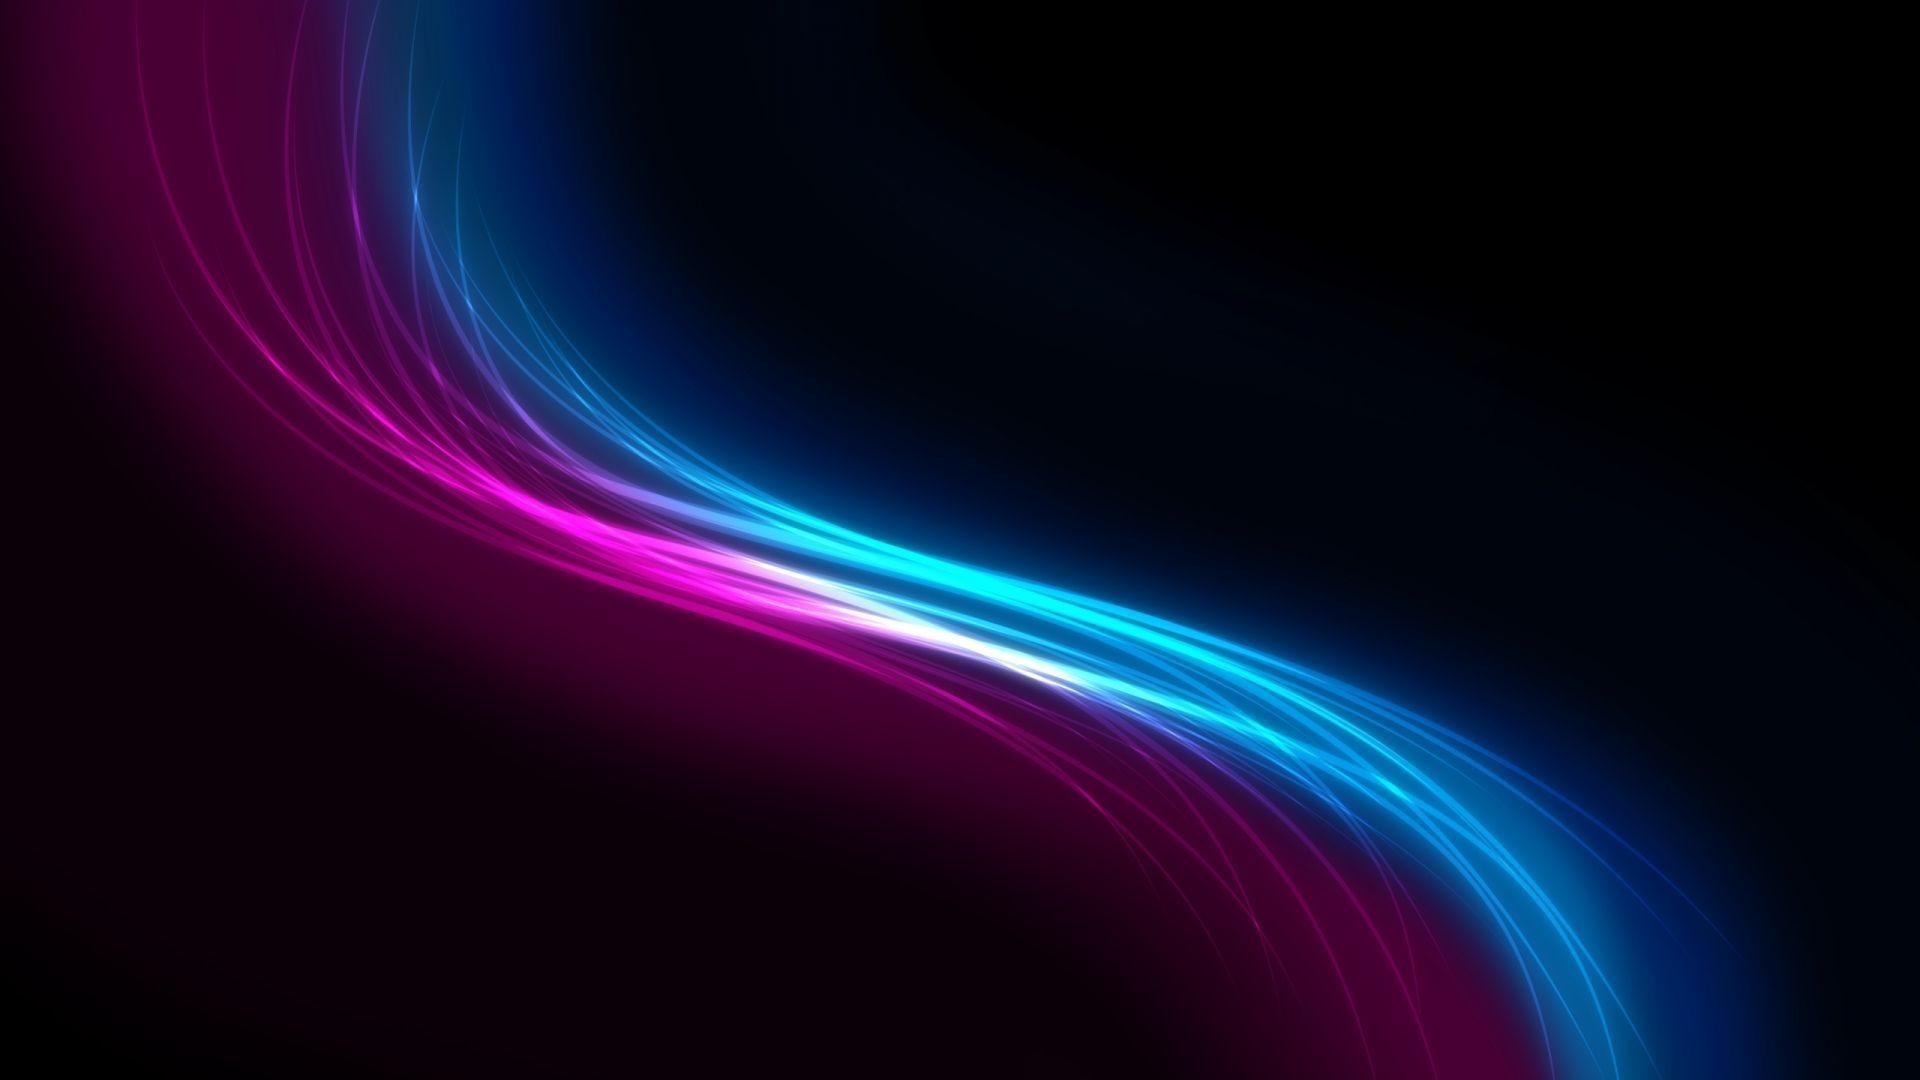 Black And Blue Desktop Wallpapers